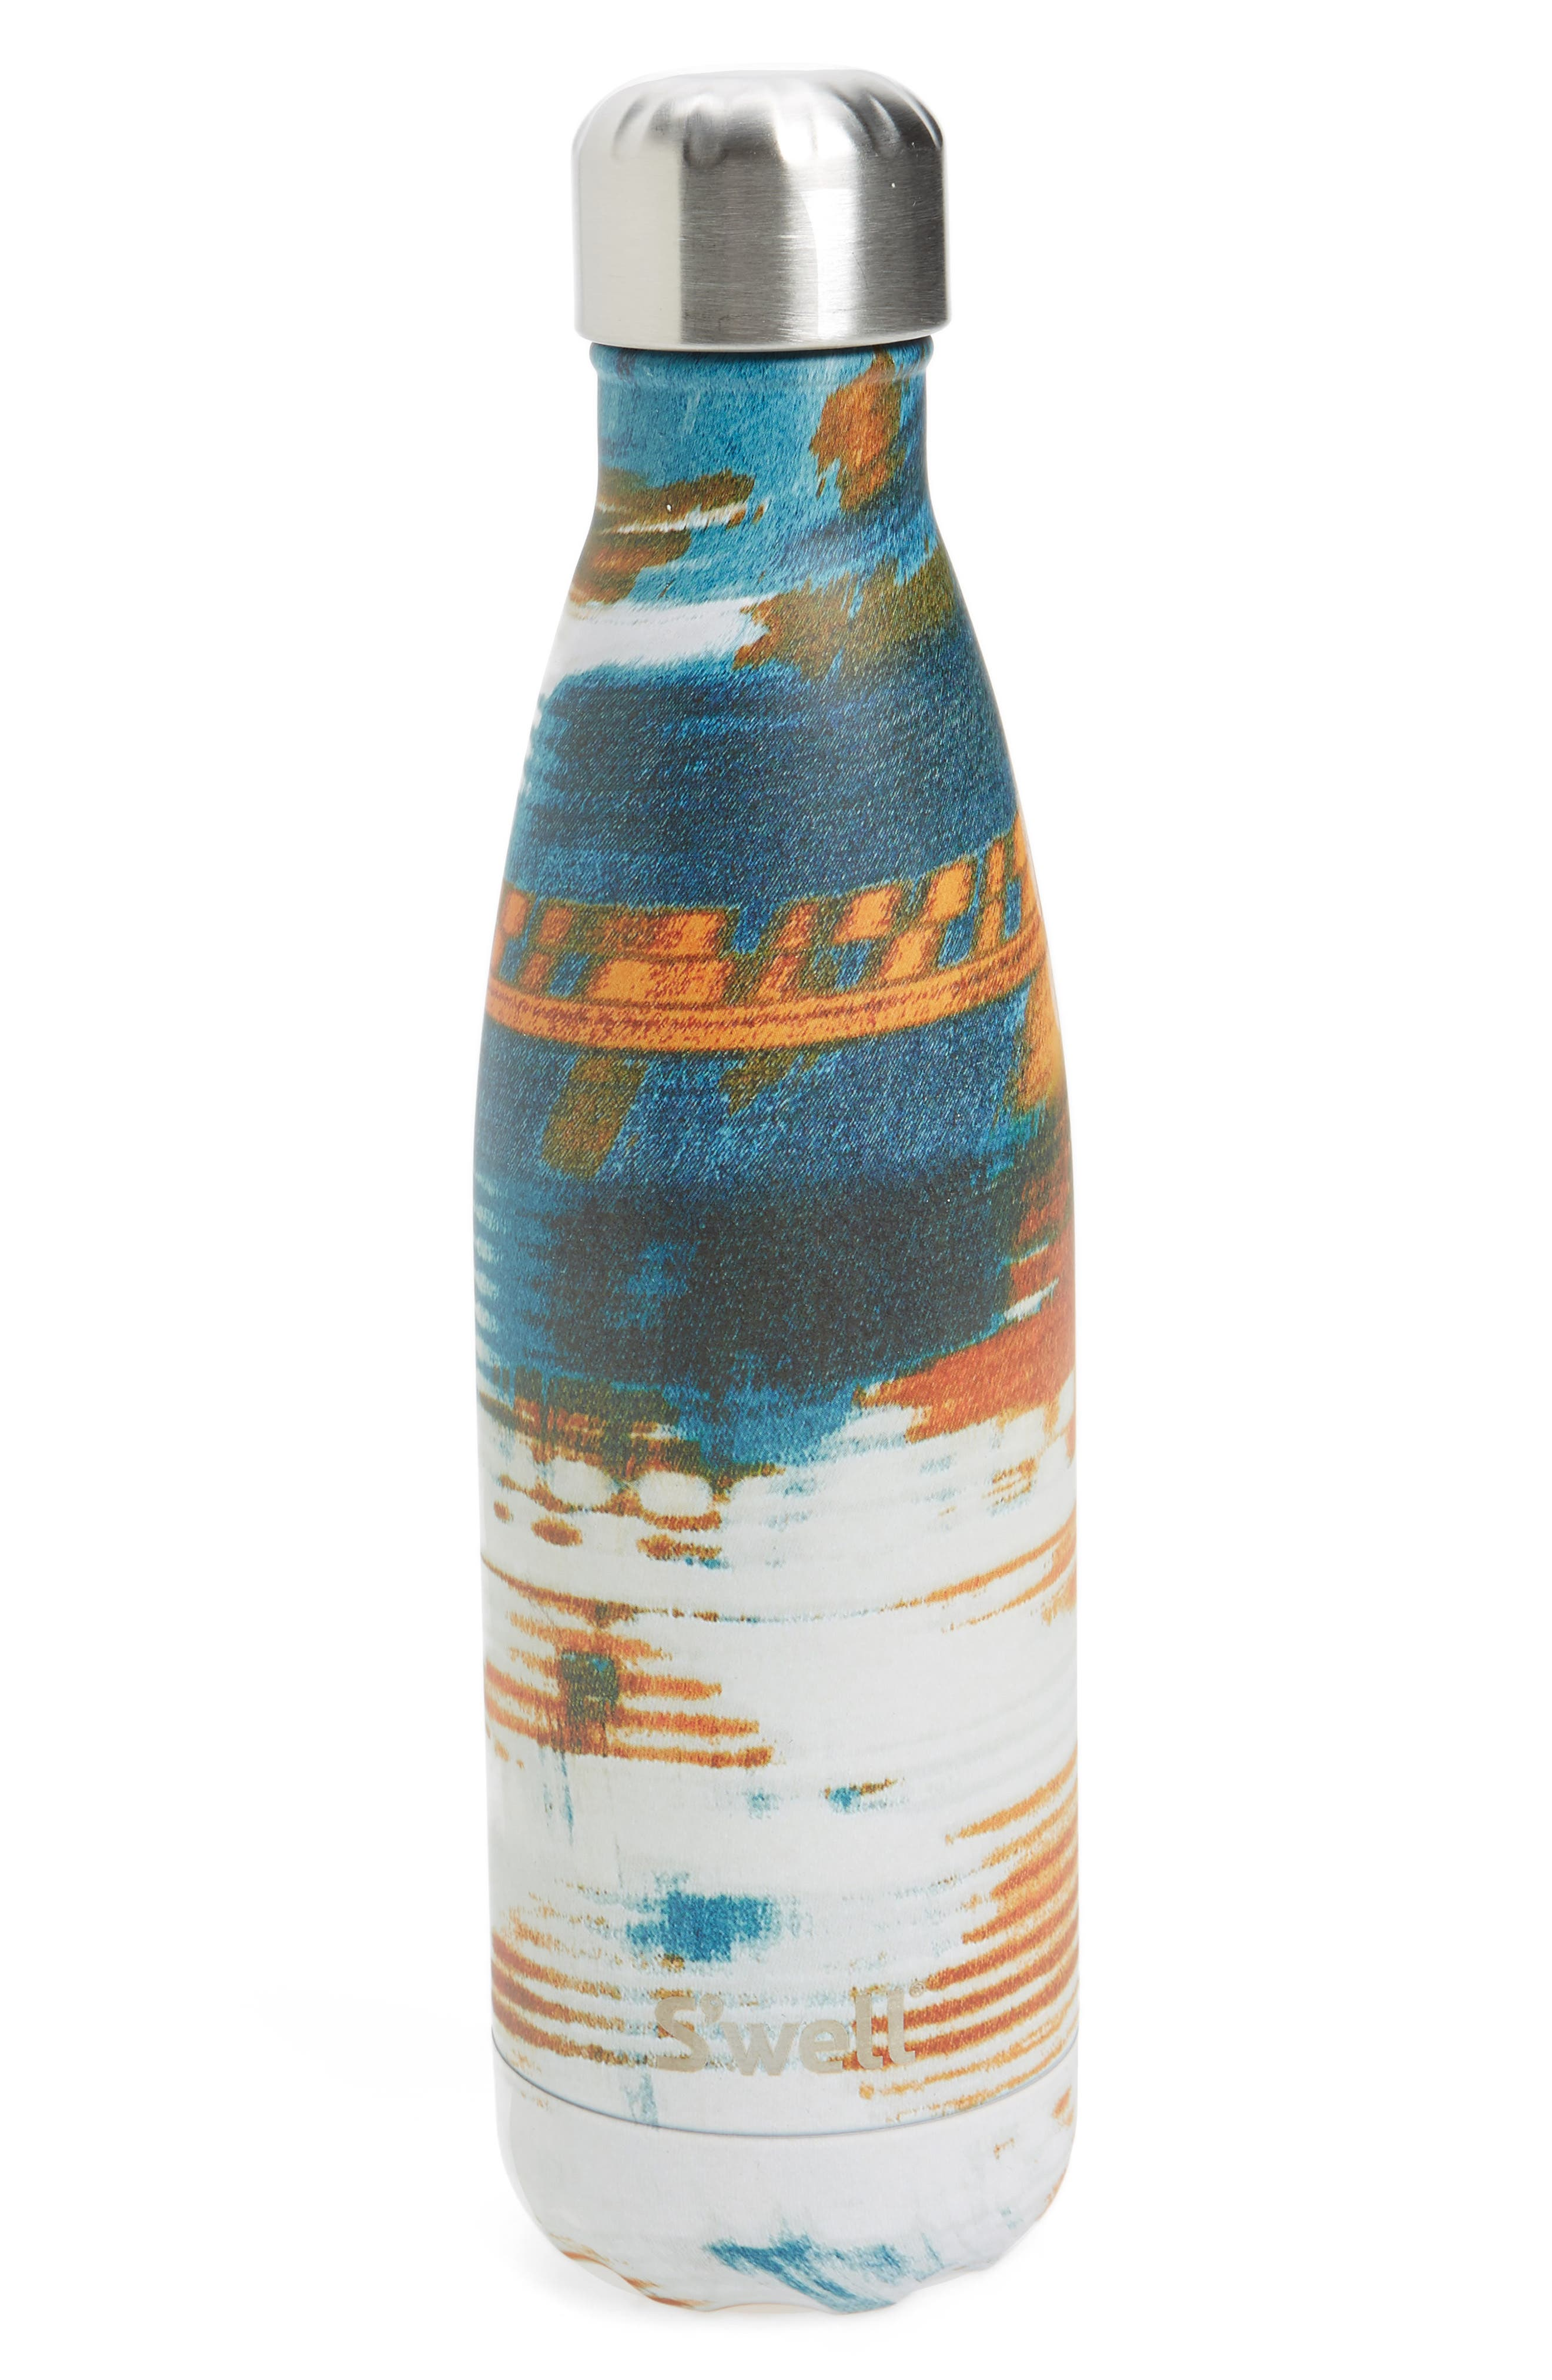 S'well Mumbai Stainless Steel Water Bottle